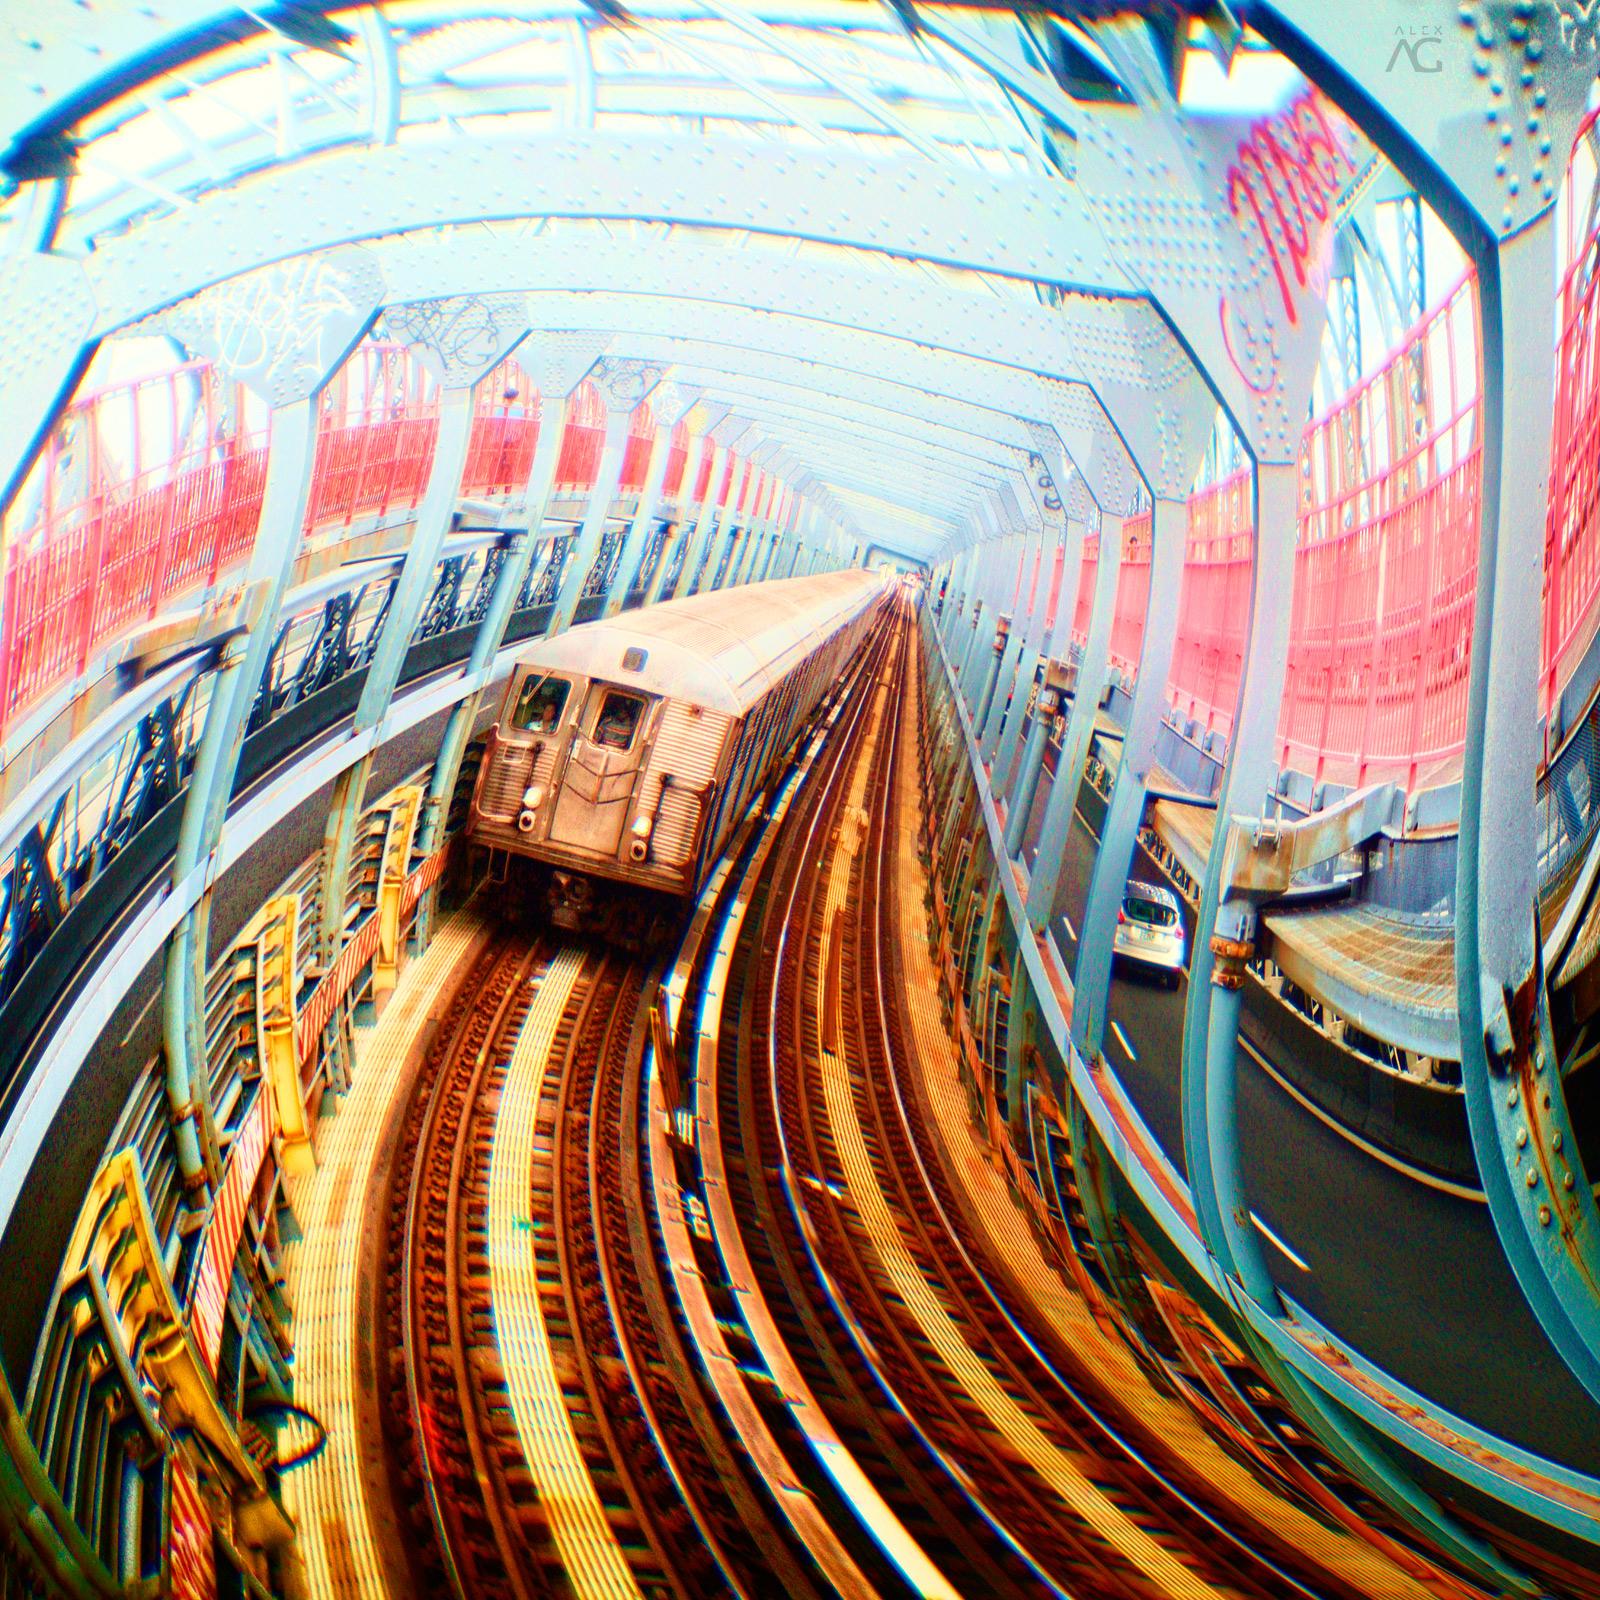 TrainPathOnWIlliamsburgBridgeFromAbove_Romanika_warped